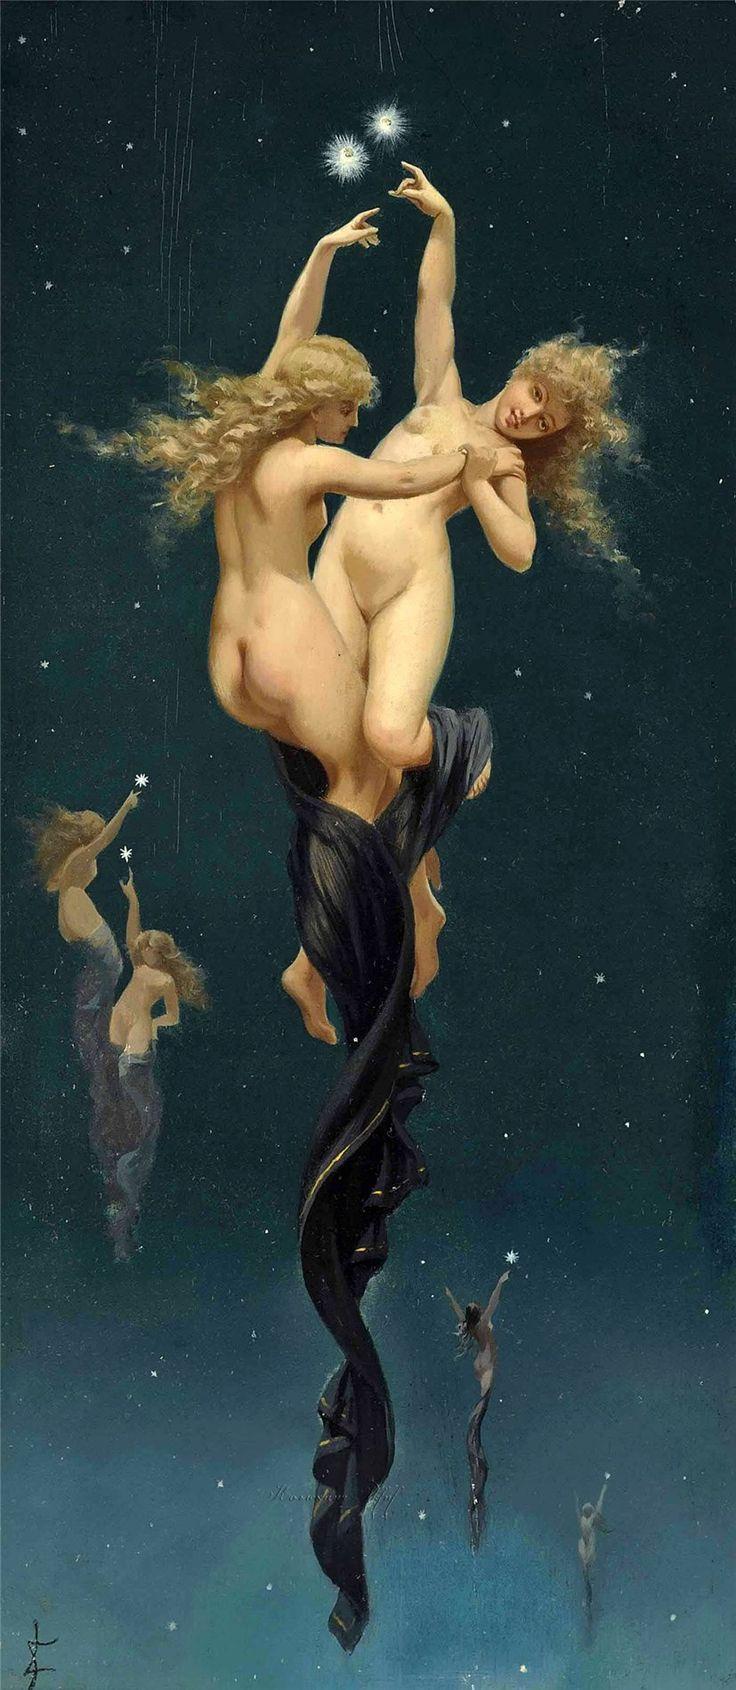 Парапсихолог - биоэнергетик, ясновидящая  Екатерина: Luis Ricardo Falero (Spanish, 1851-1896) - 1